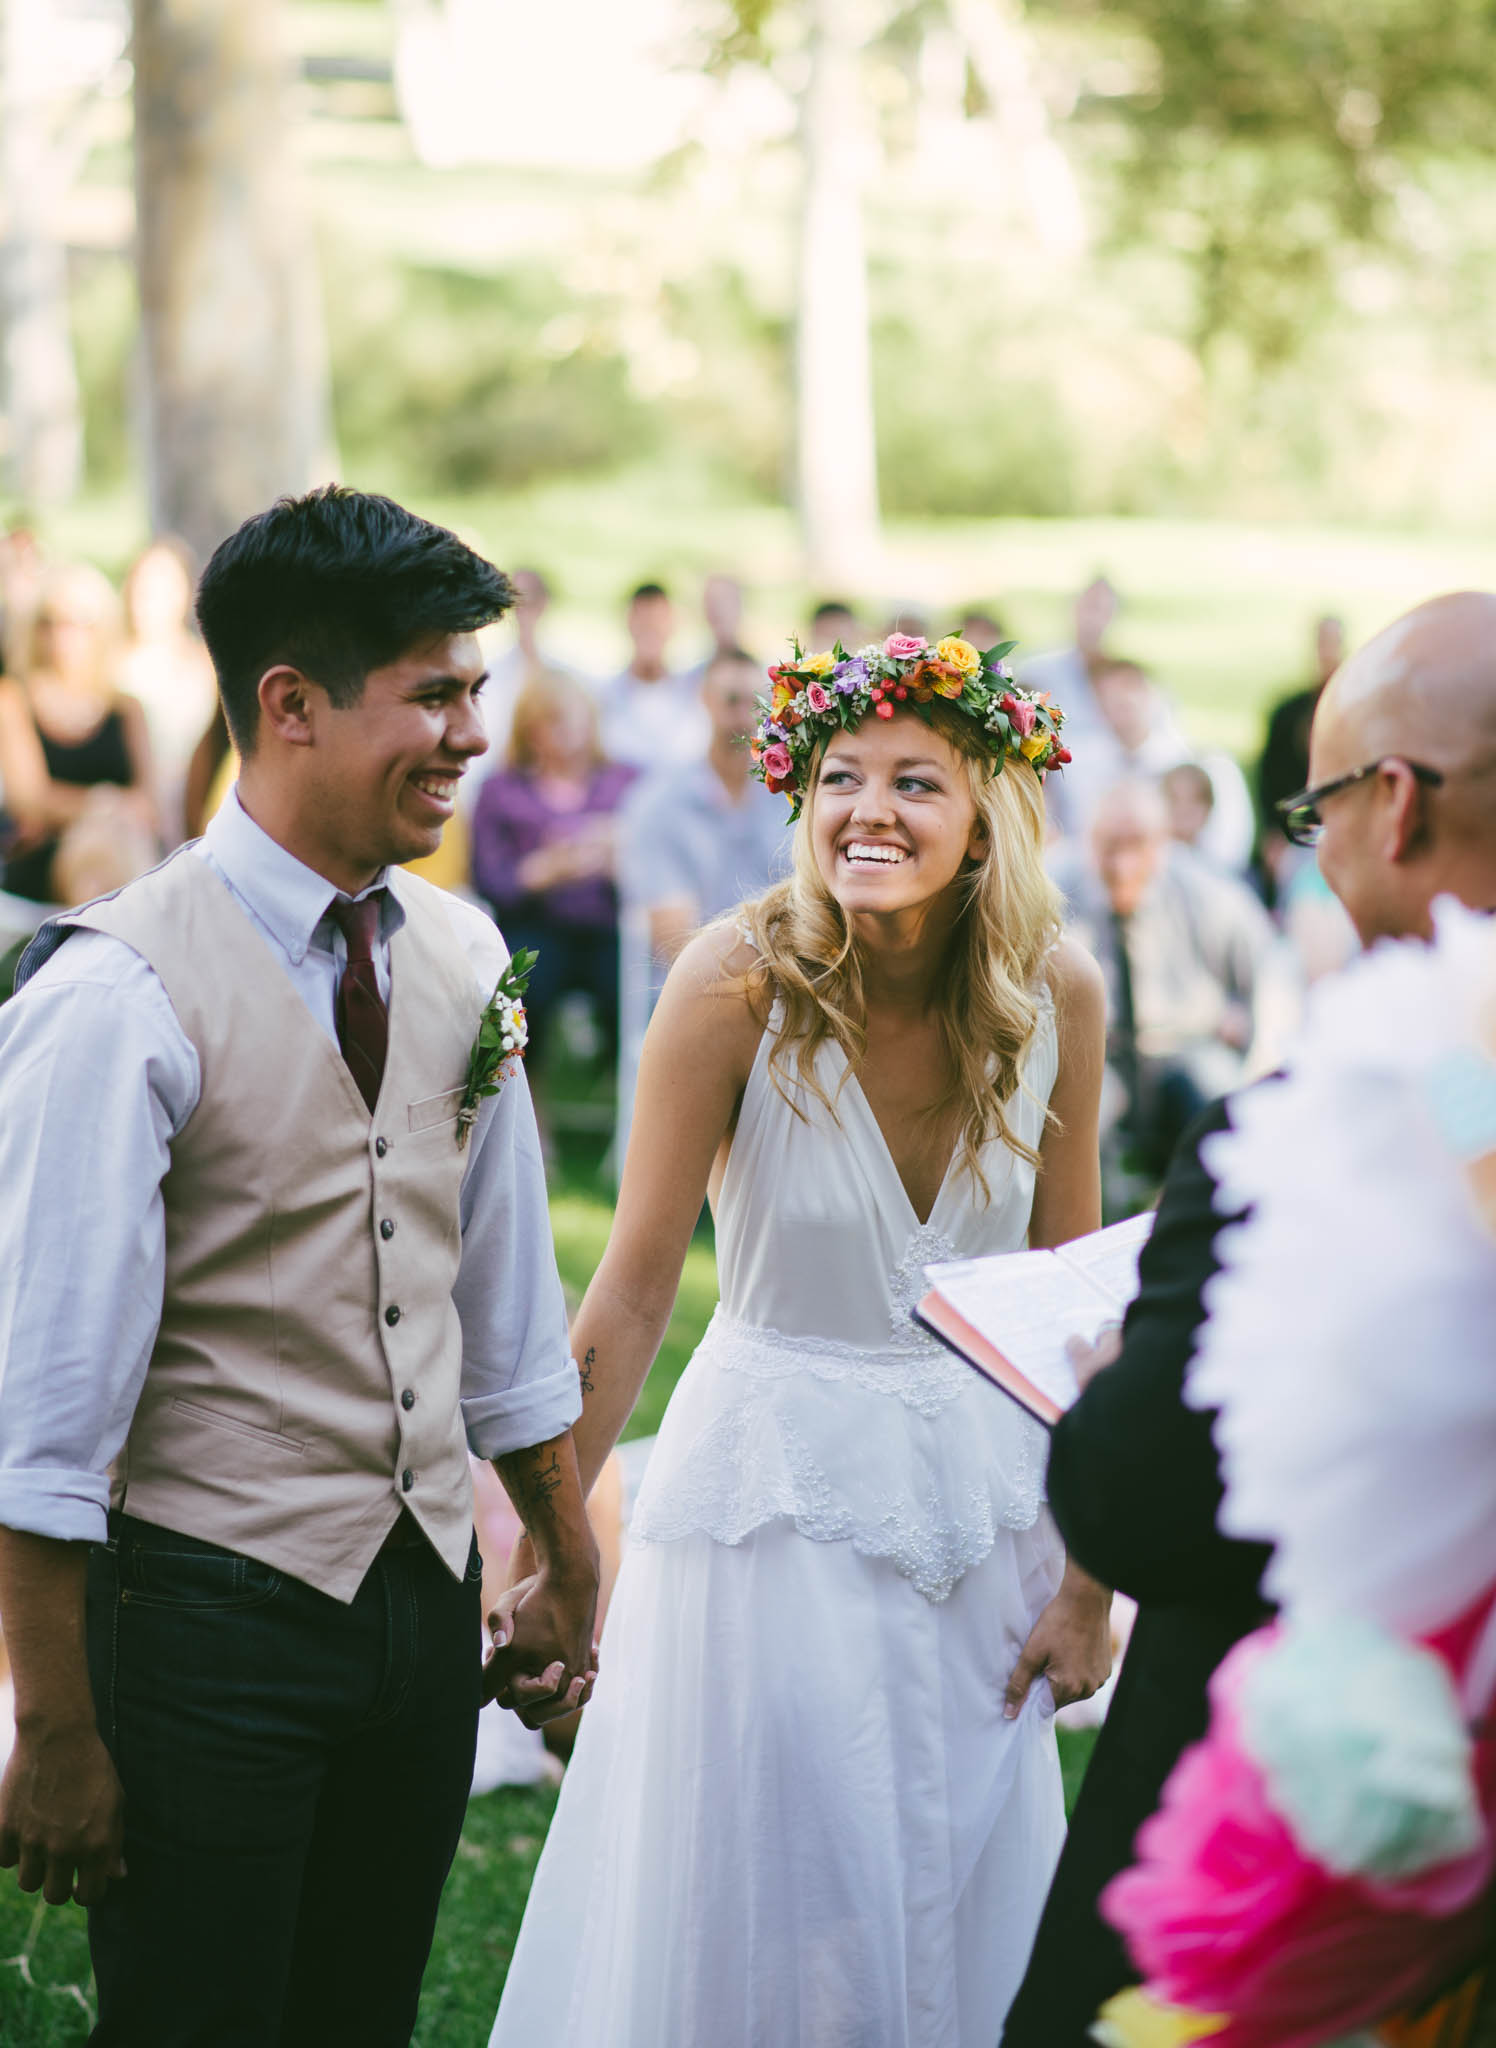 ©Isaiah & Taylor Photography - Los Angeles Wedding Photographer - Mexican Bohemian Wedding, Laguna Niguel Regional Park, Orange County-30.jpg